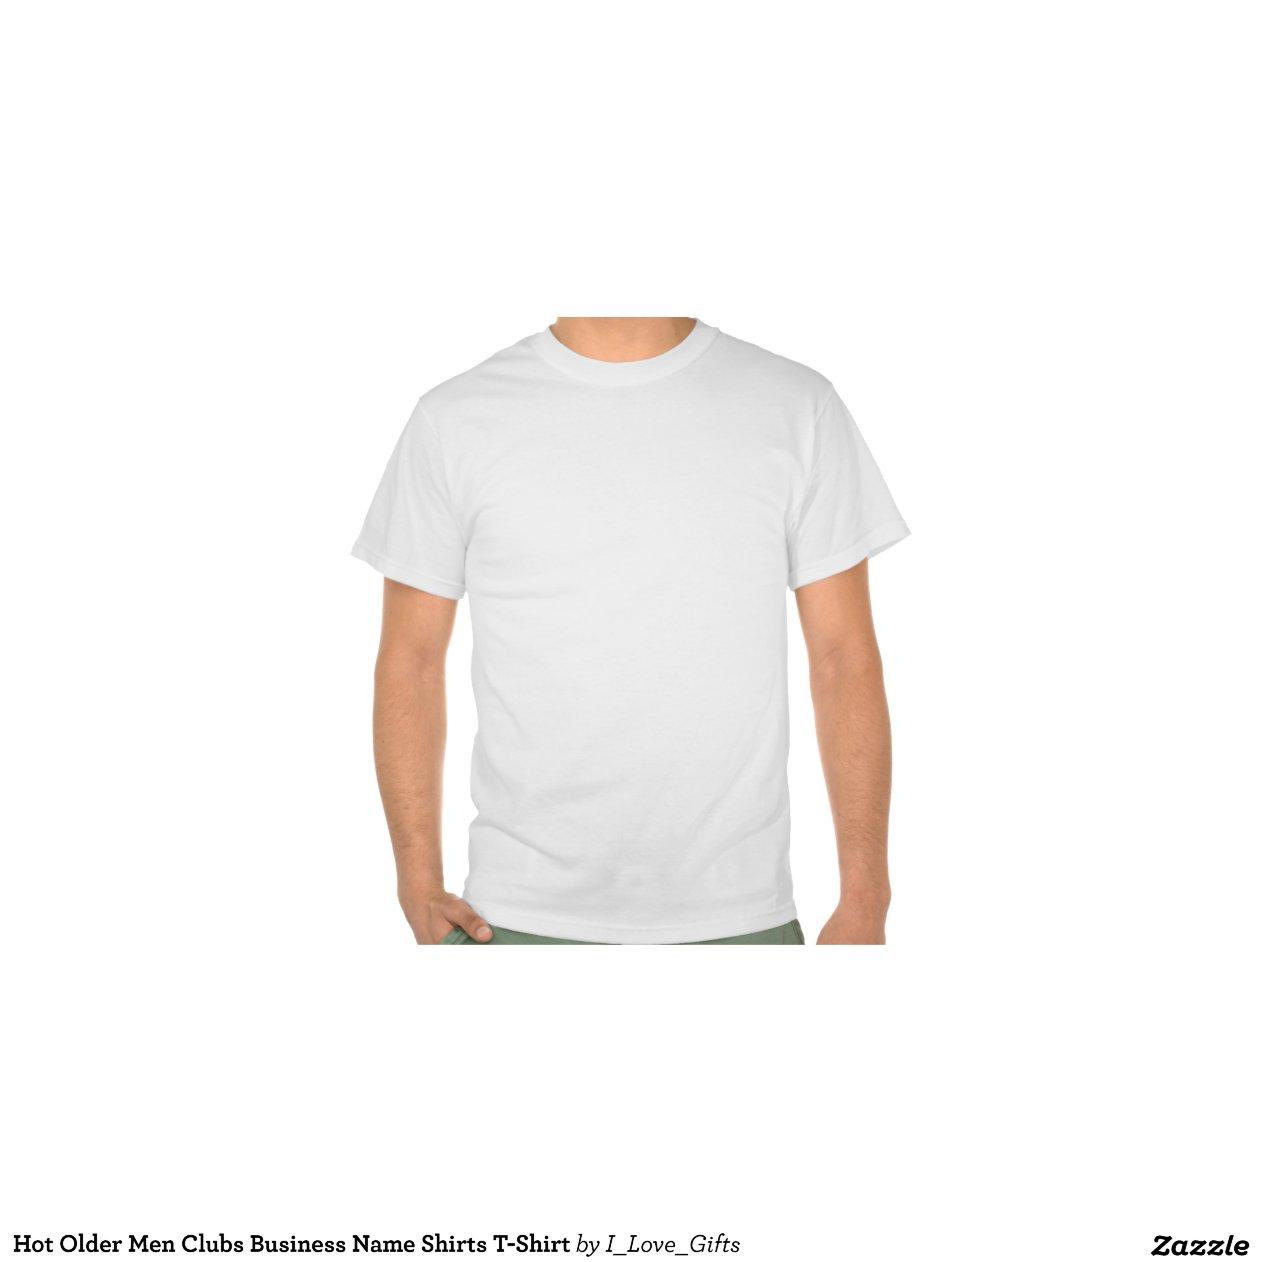 Hot older men clubs business name shirts t shirt tee for T shirt business name ideas